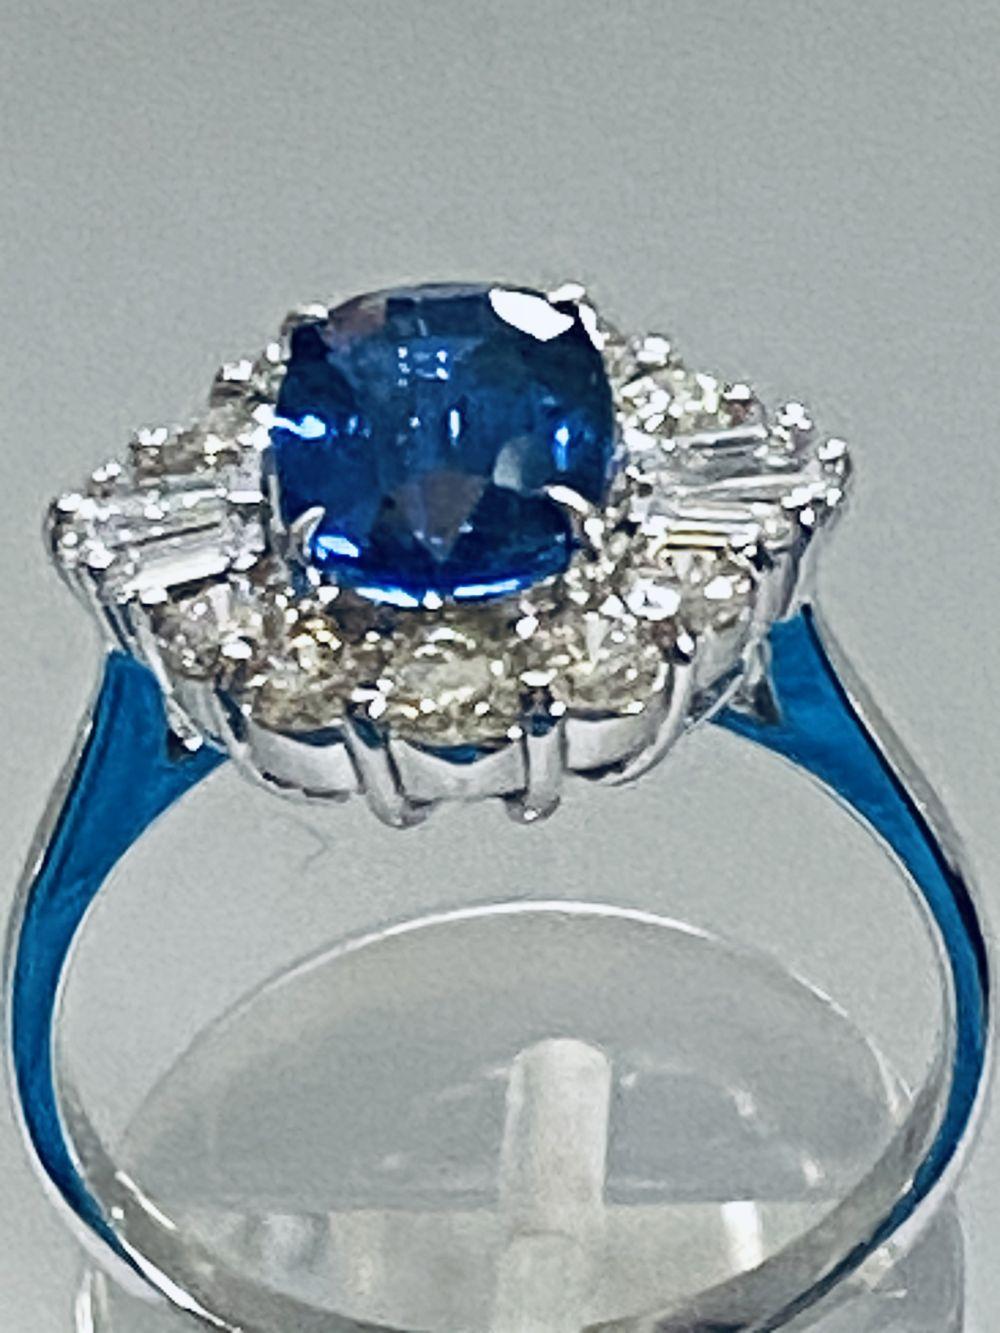 ART DECO DIAMOND AND CEYLON SAPPHIRE CLUSTER RING - Image 4 of 7